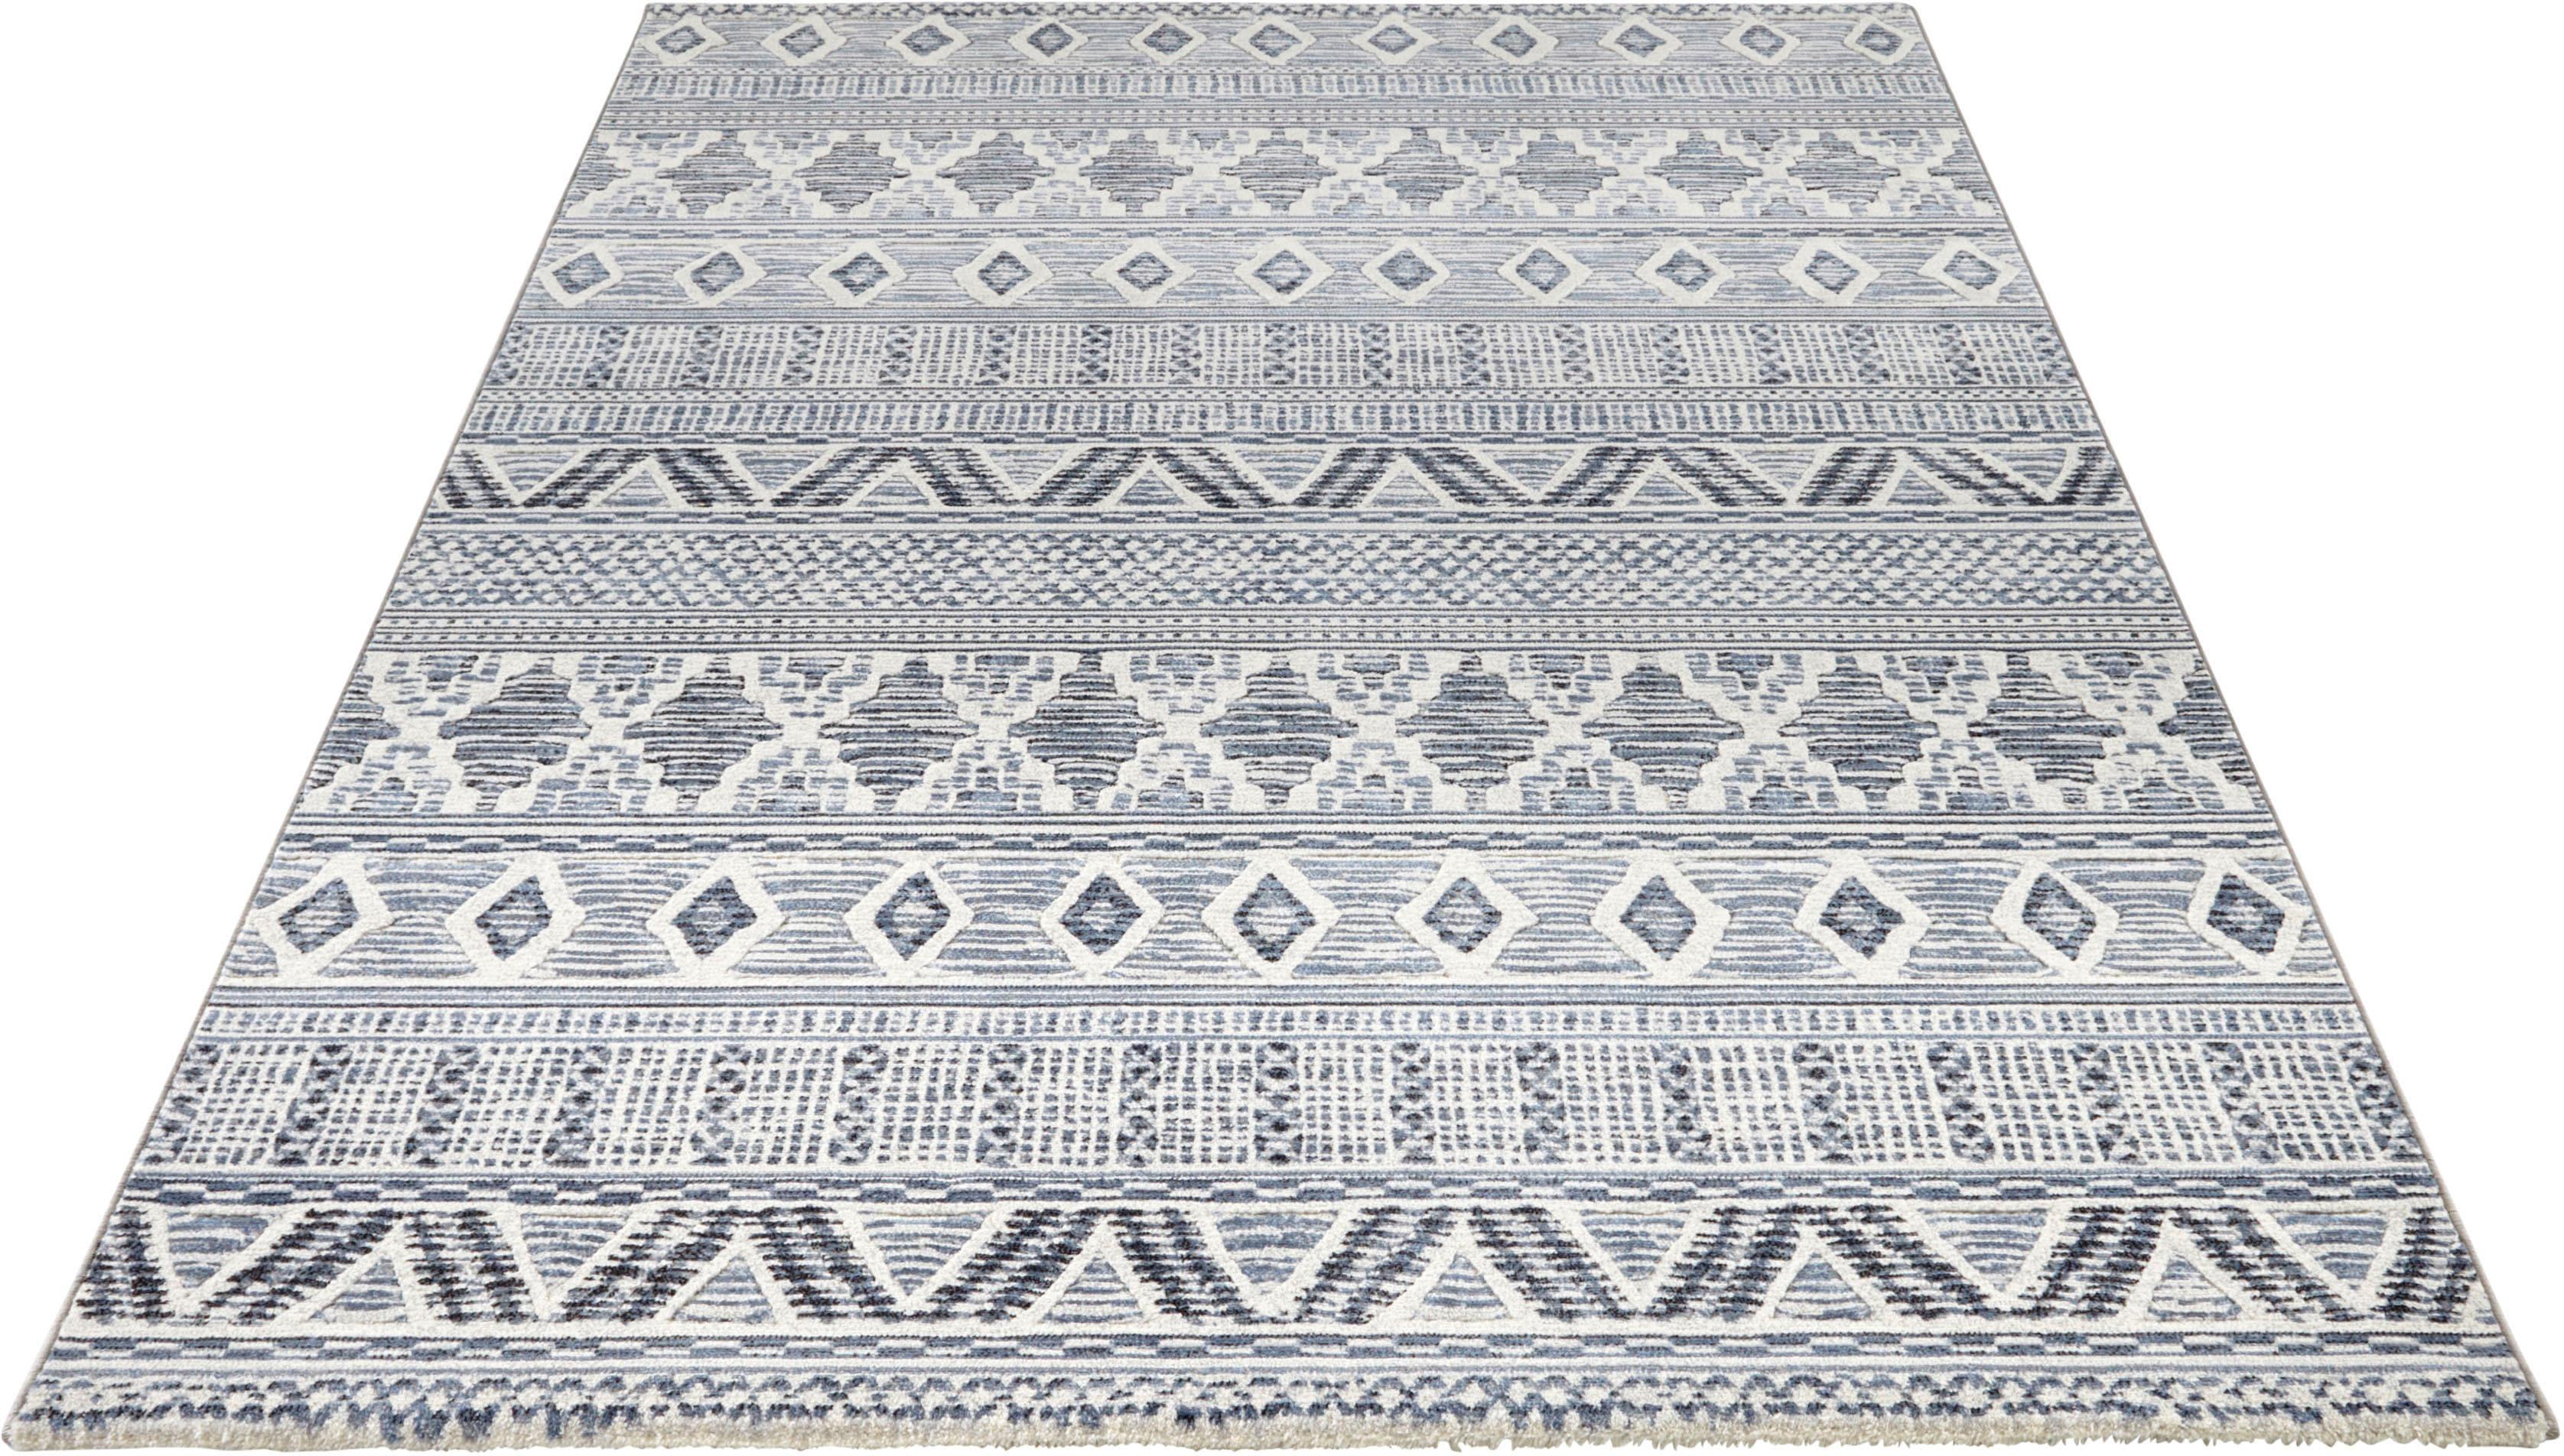 Teppich Roanne ELLE Decor rechteckig Höhe 11 mm maschinell gewebt